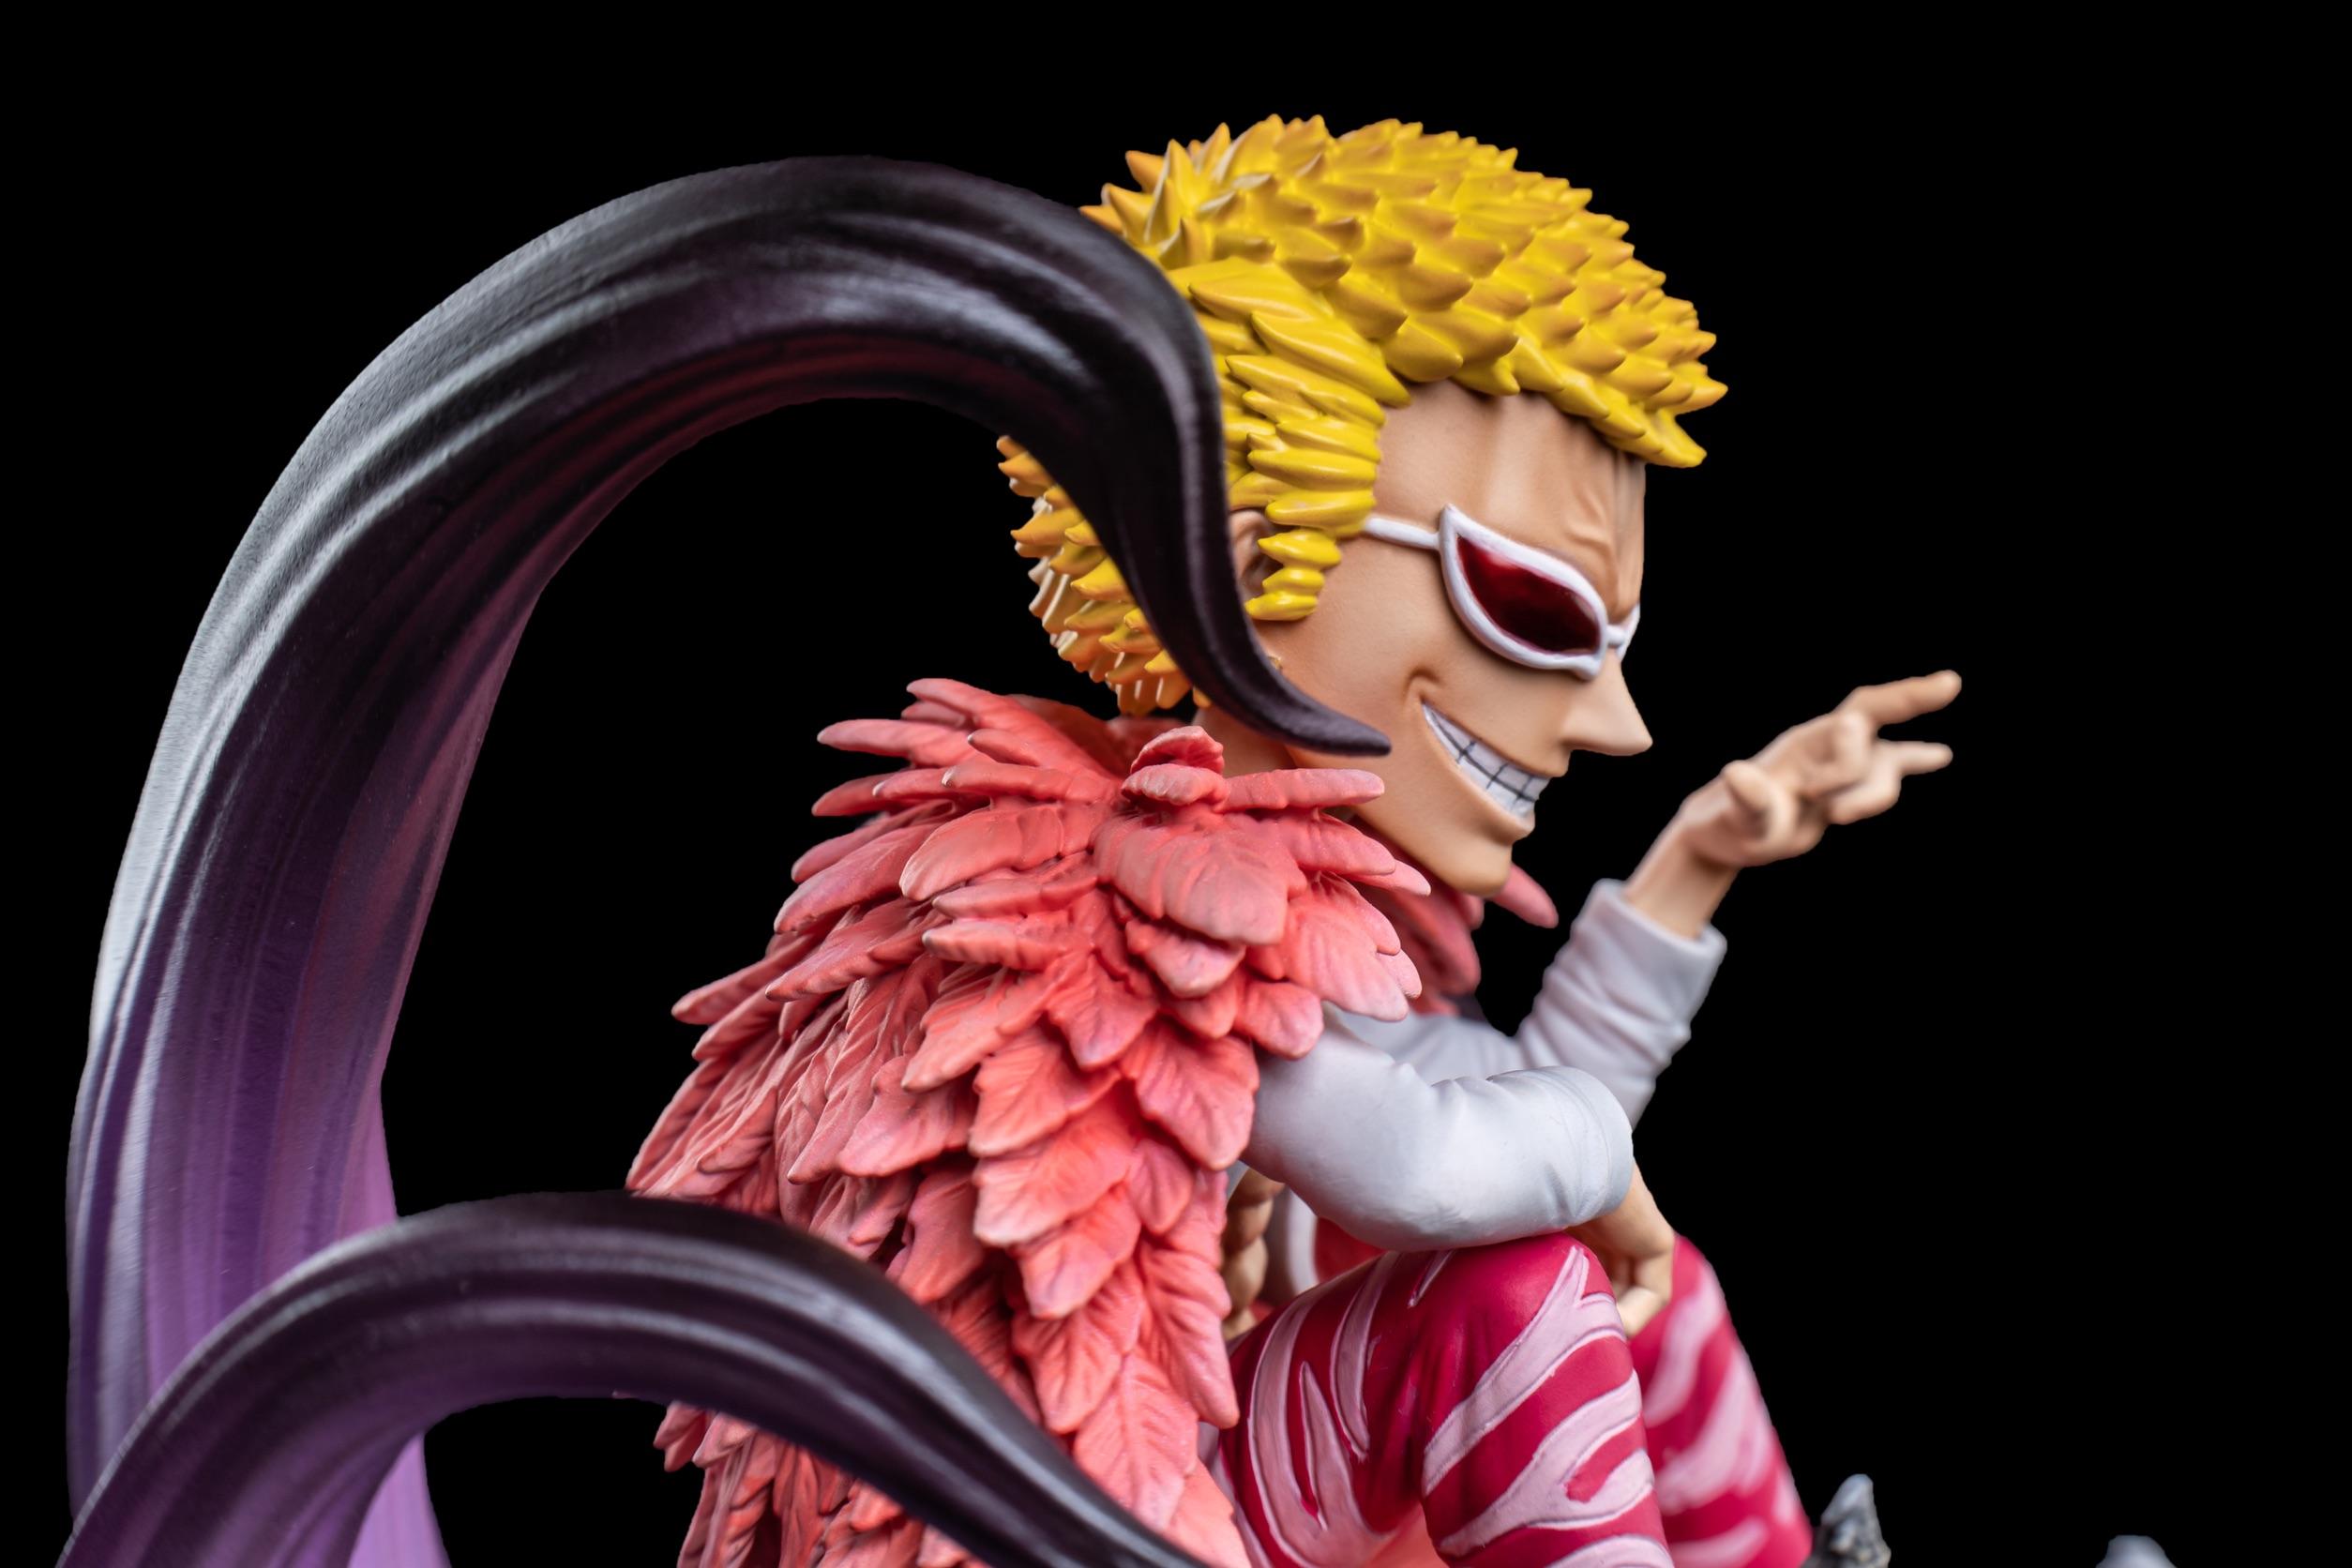 Doflamingo The Joker by OMO Studio (มัดจำ) [[SOLD OUT]]